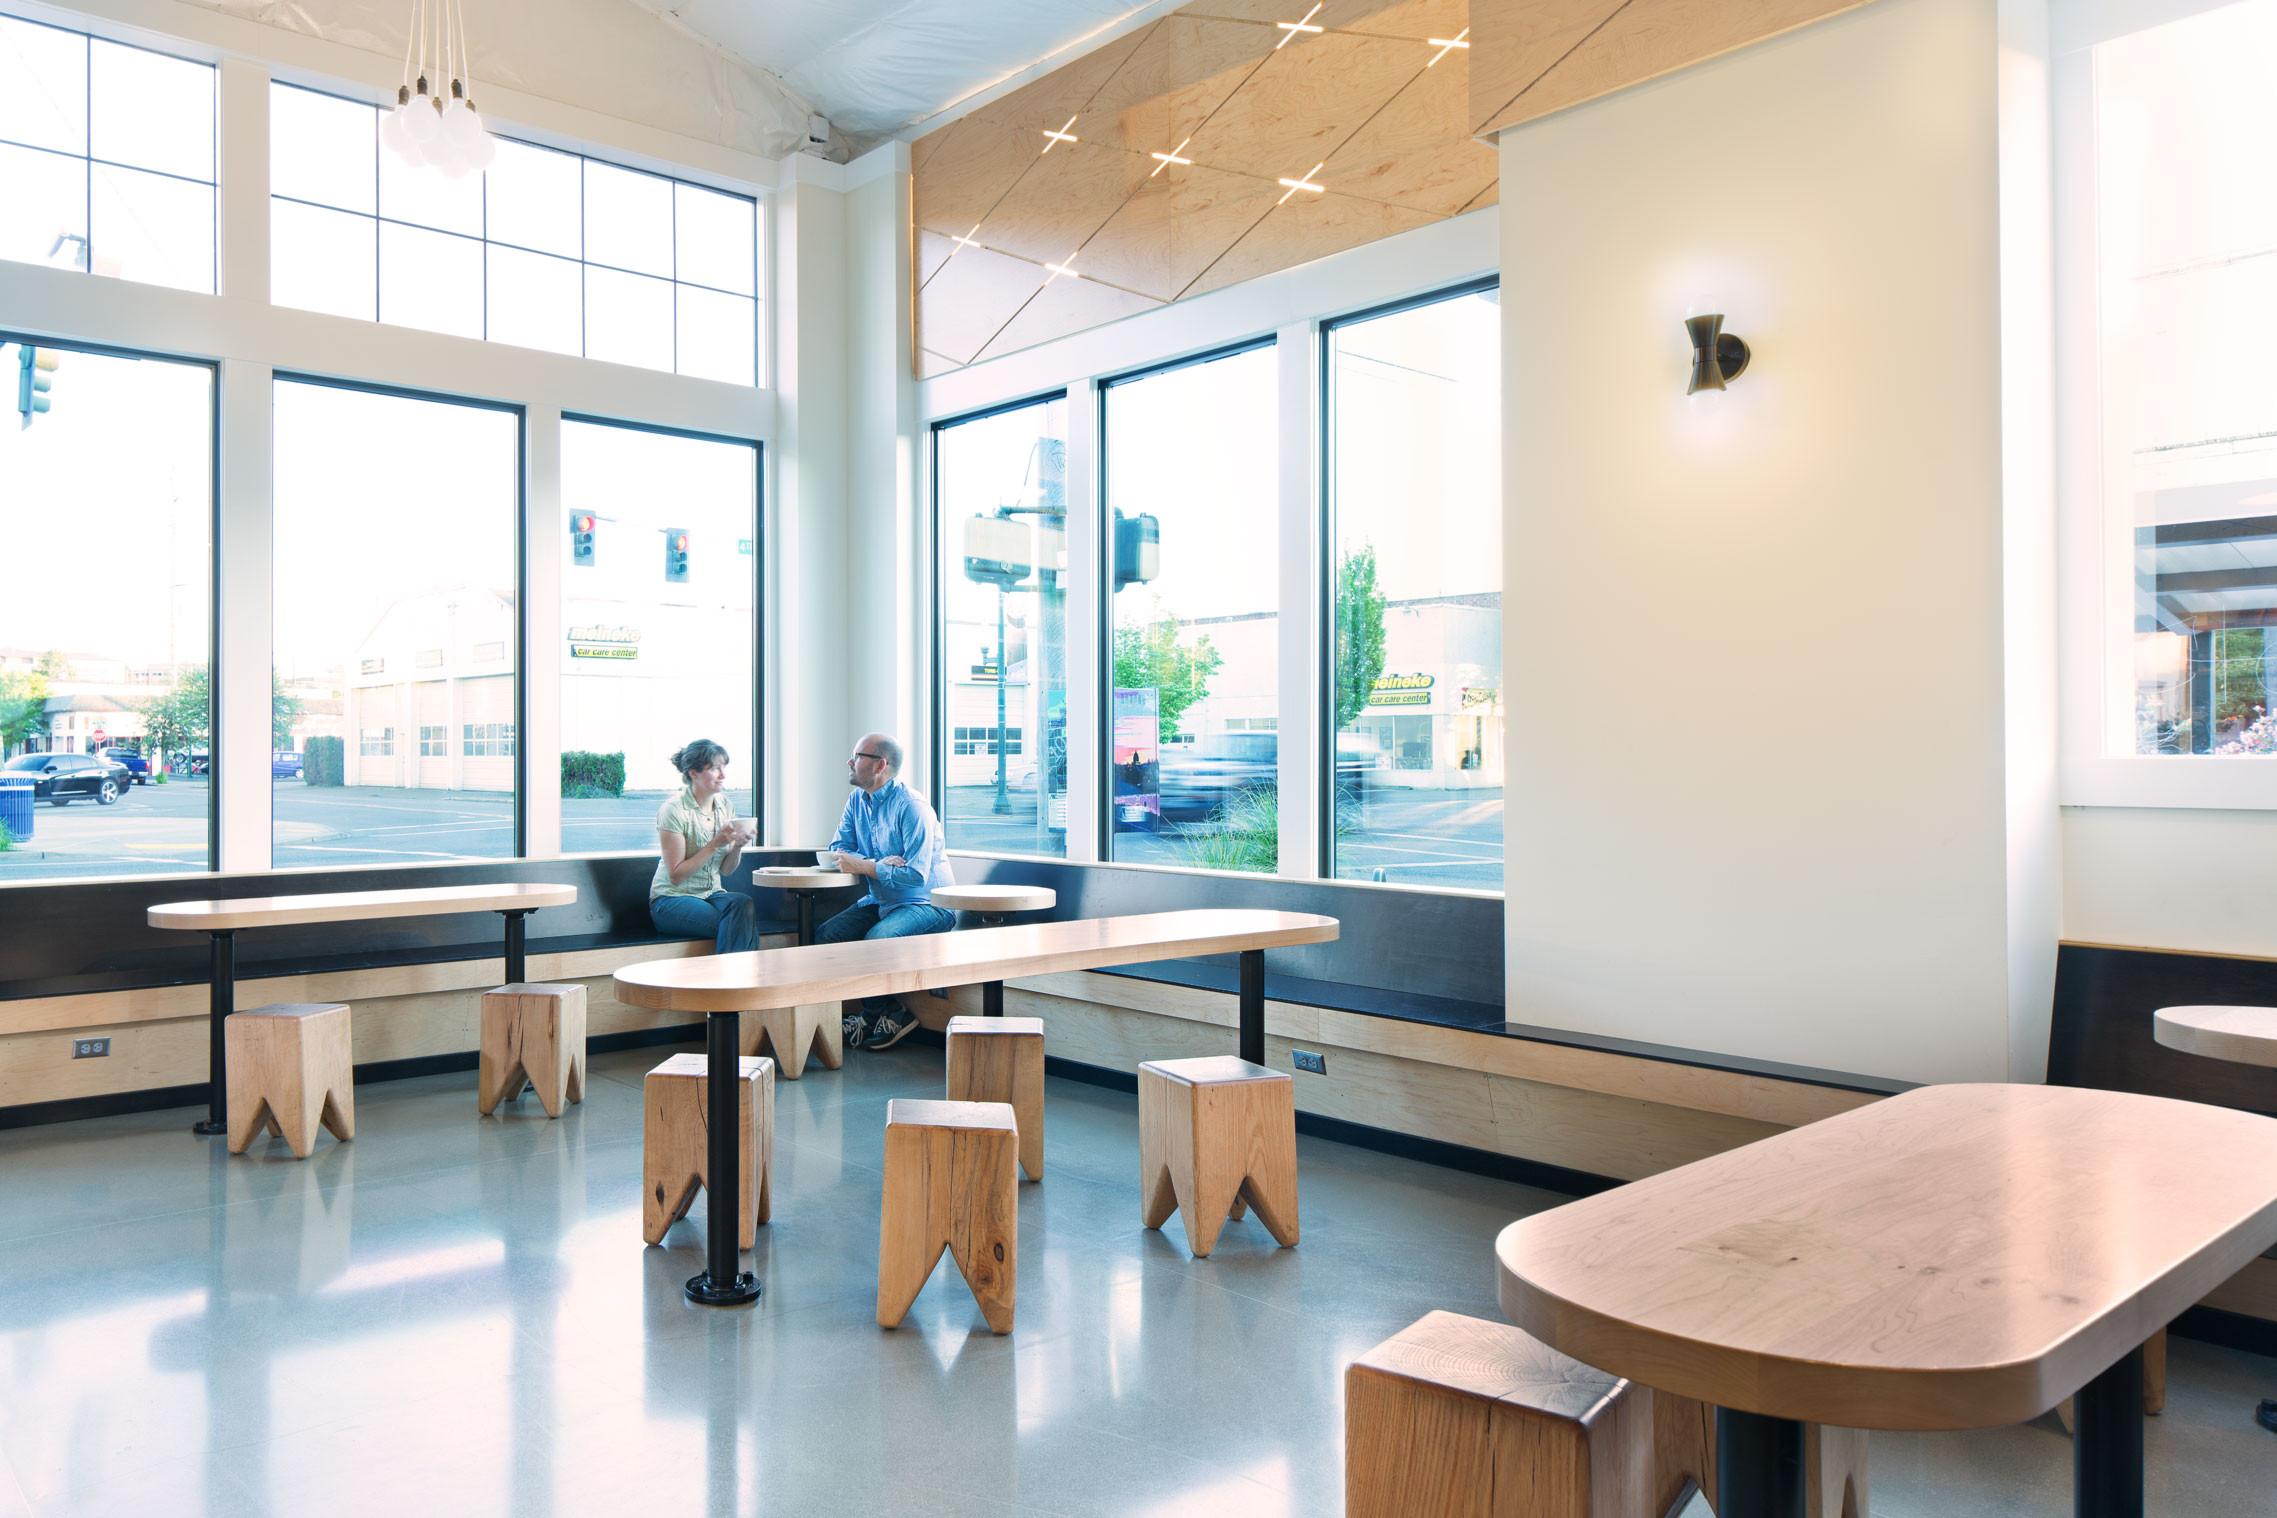 Commercial Design Build Seattle Commercial Architects Artisans